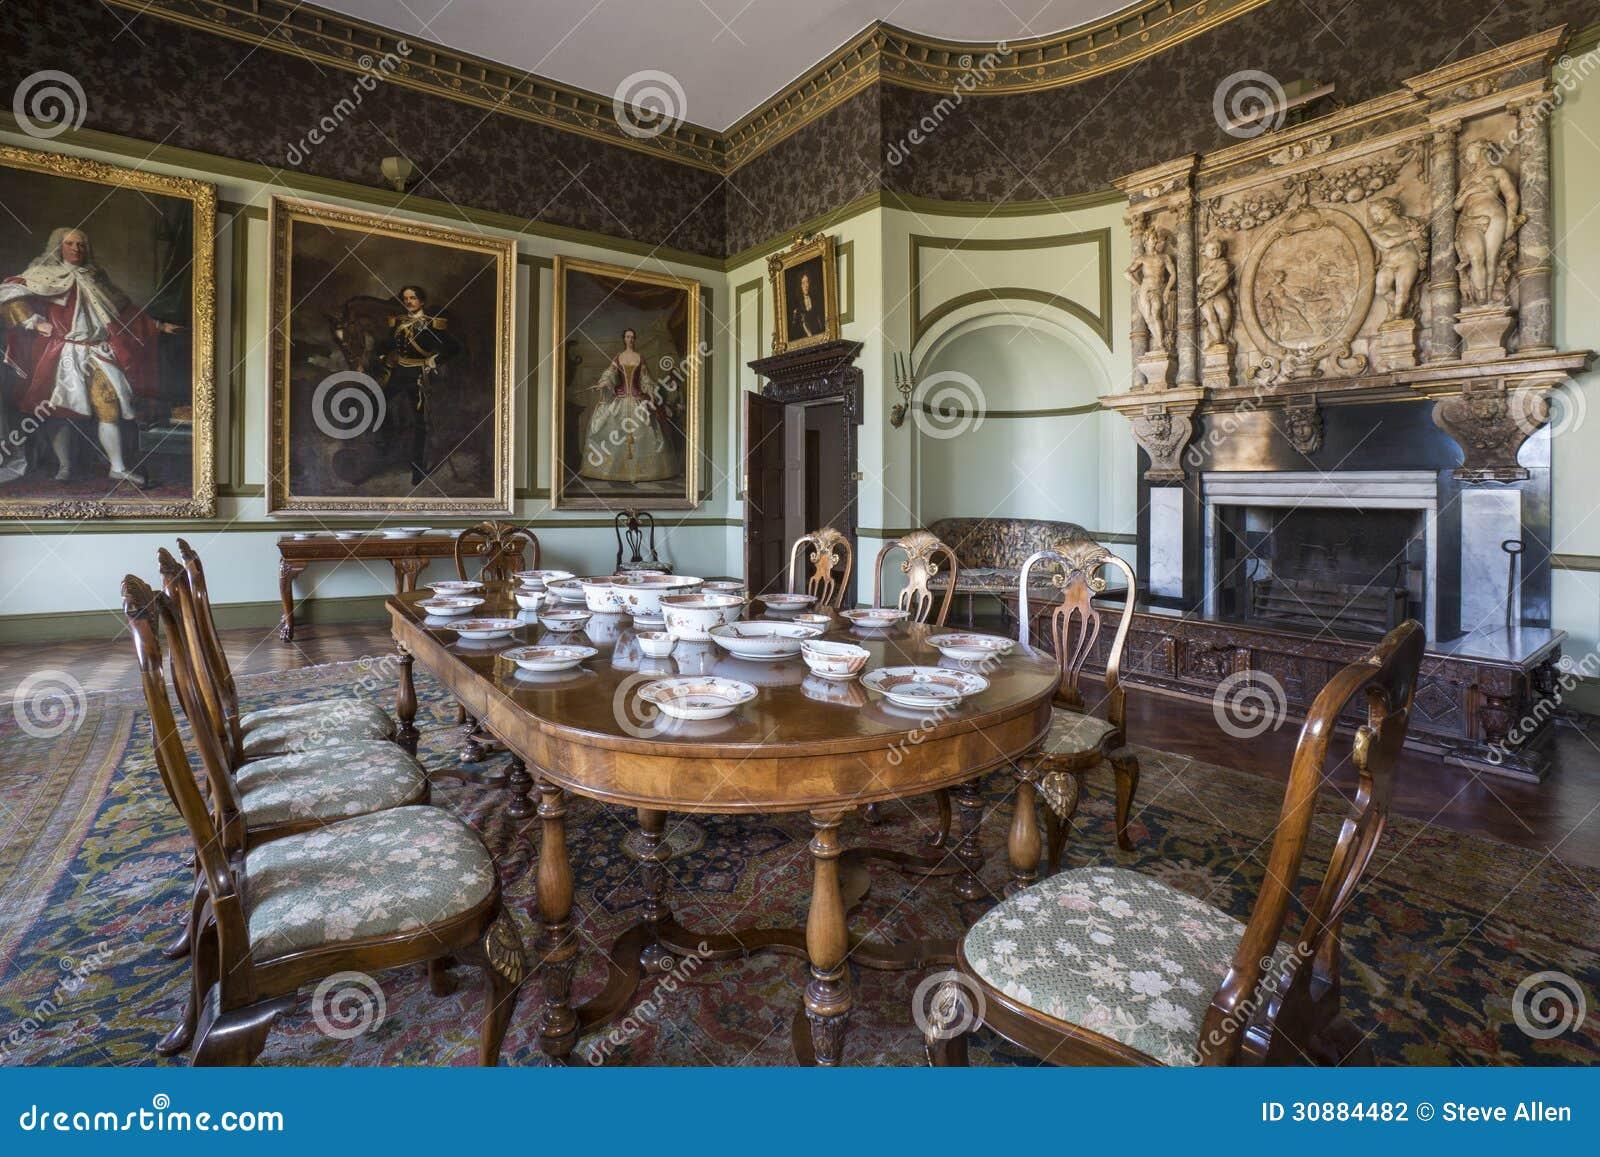 Design house yorkshire - Manor House Yorkshire England